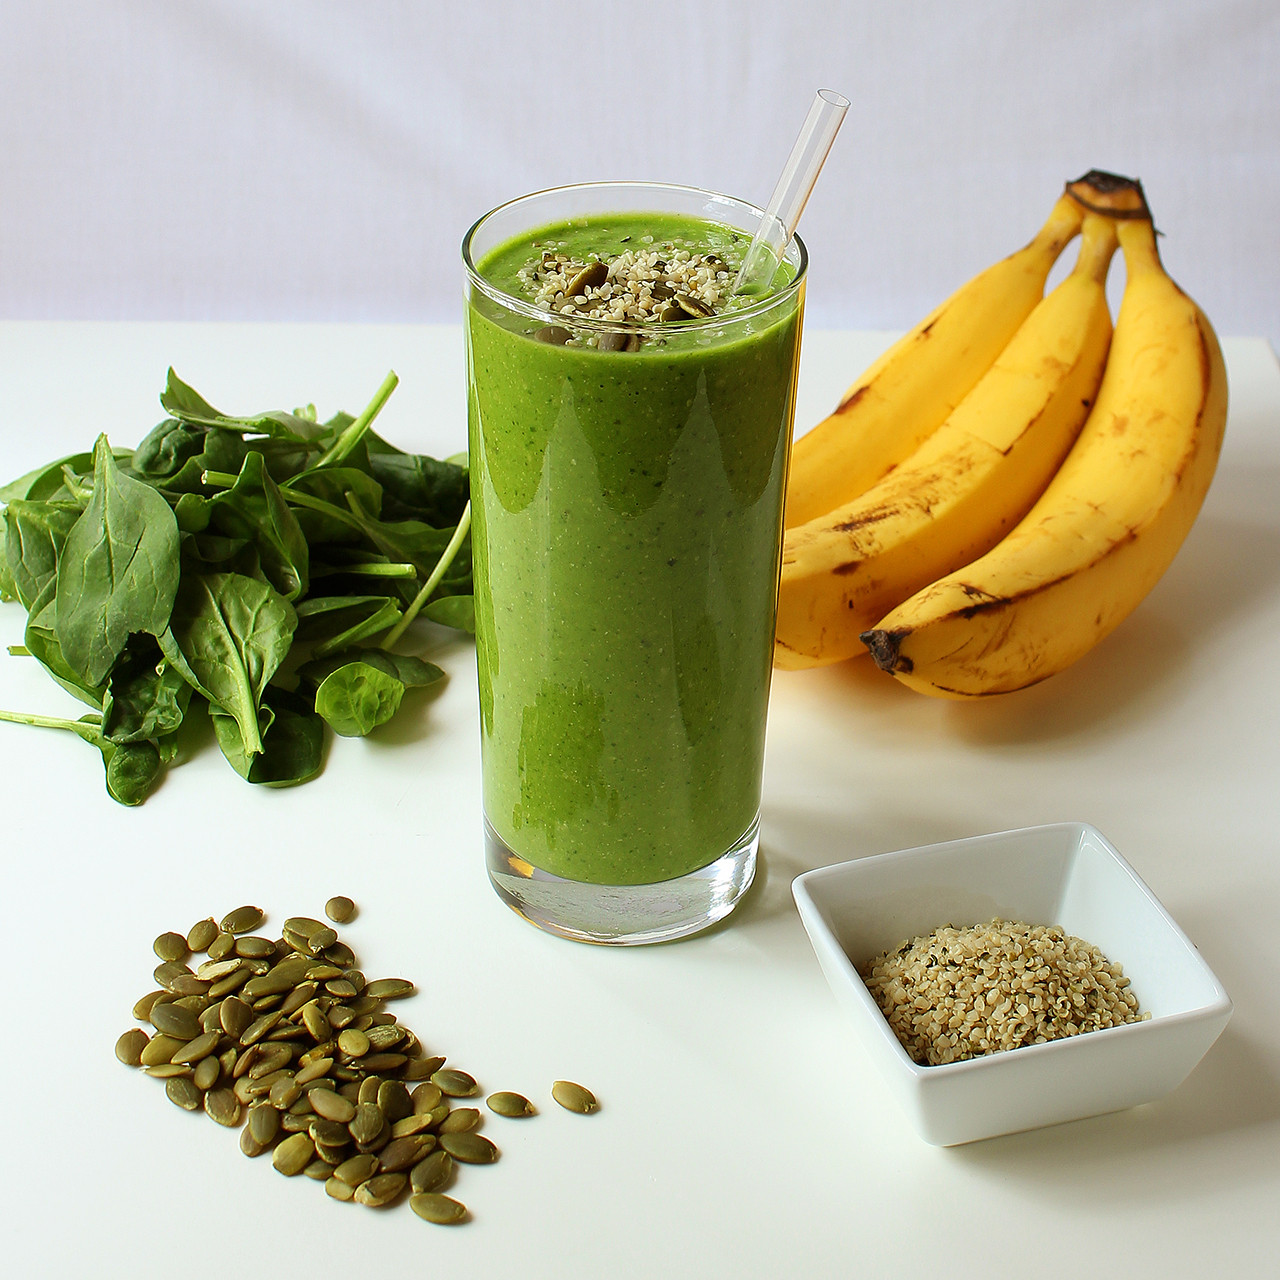 Healthy Vegetable Smoothies  Green Protein Power Breakfast Smoothie I LOVE VEGAN